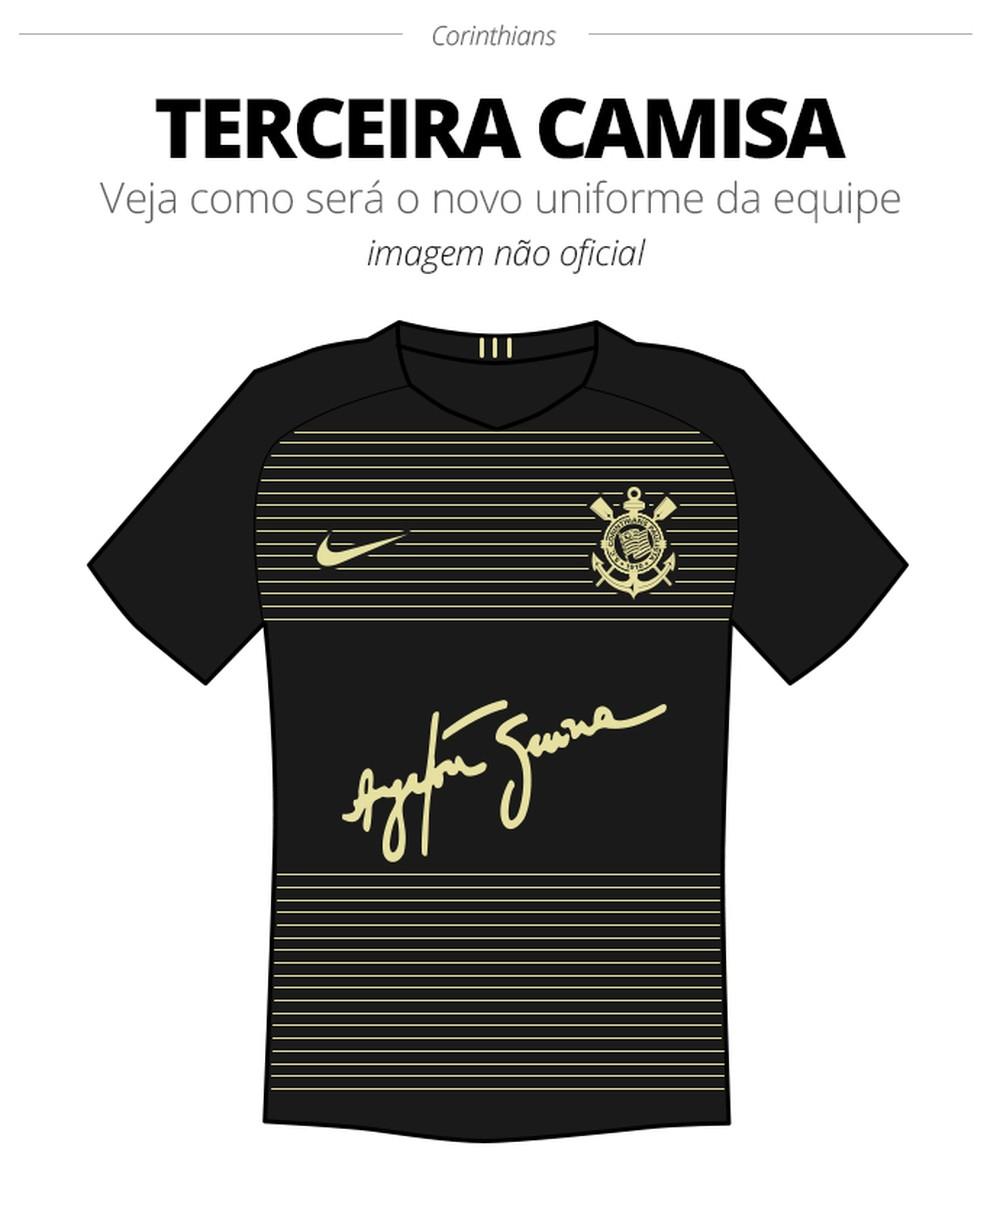 Camisa III - Corinthians Ayrton Senna